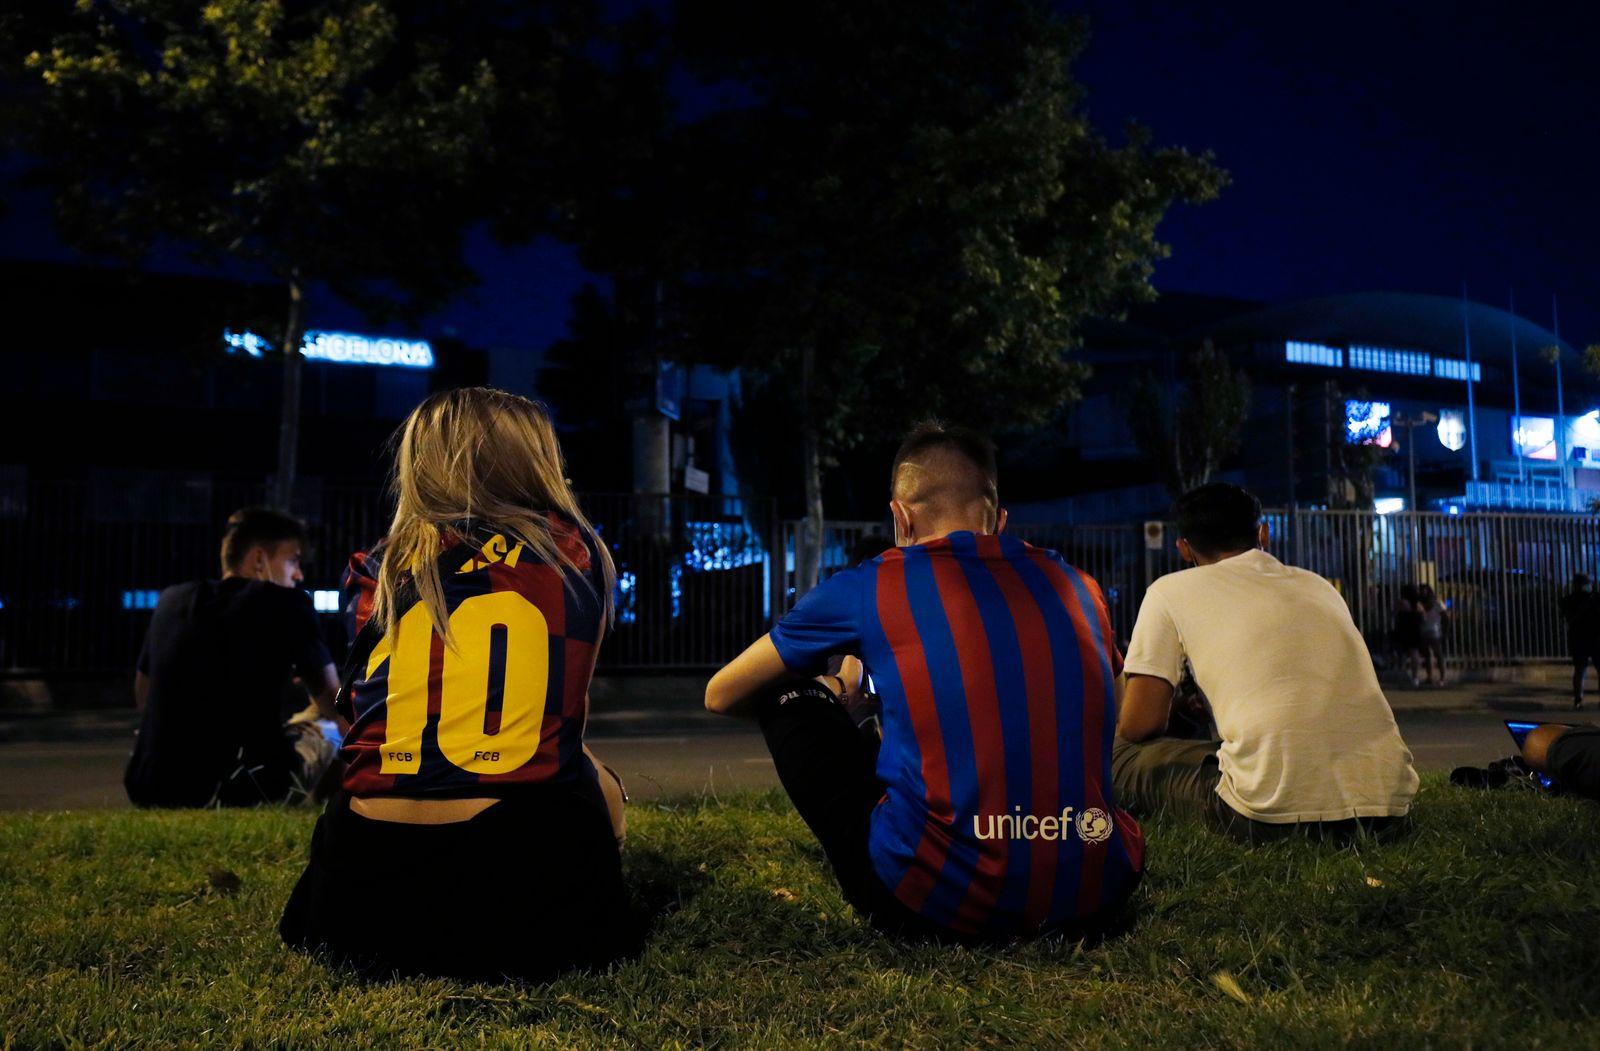 FC Barcelona announce Lionel Messi will leave the club